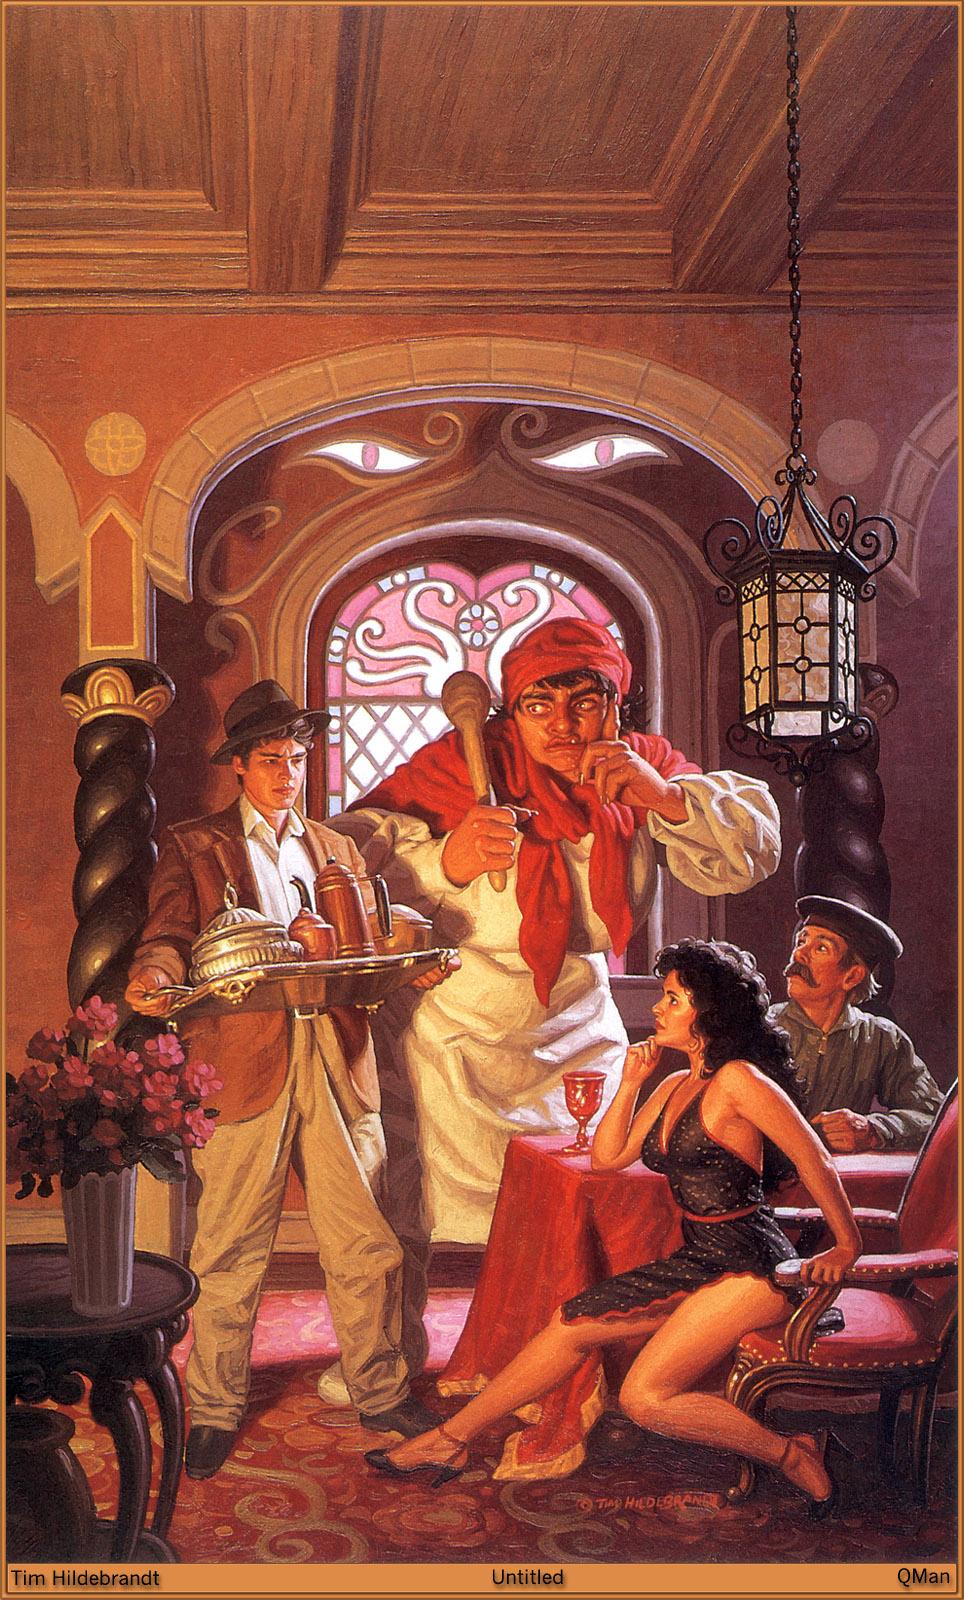 TIM HILDEBRANDT - The Fantasy Art Techniques